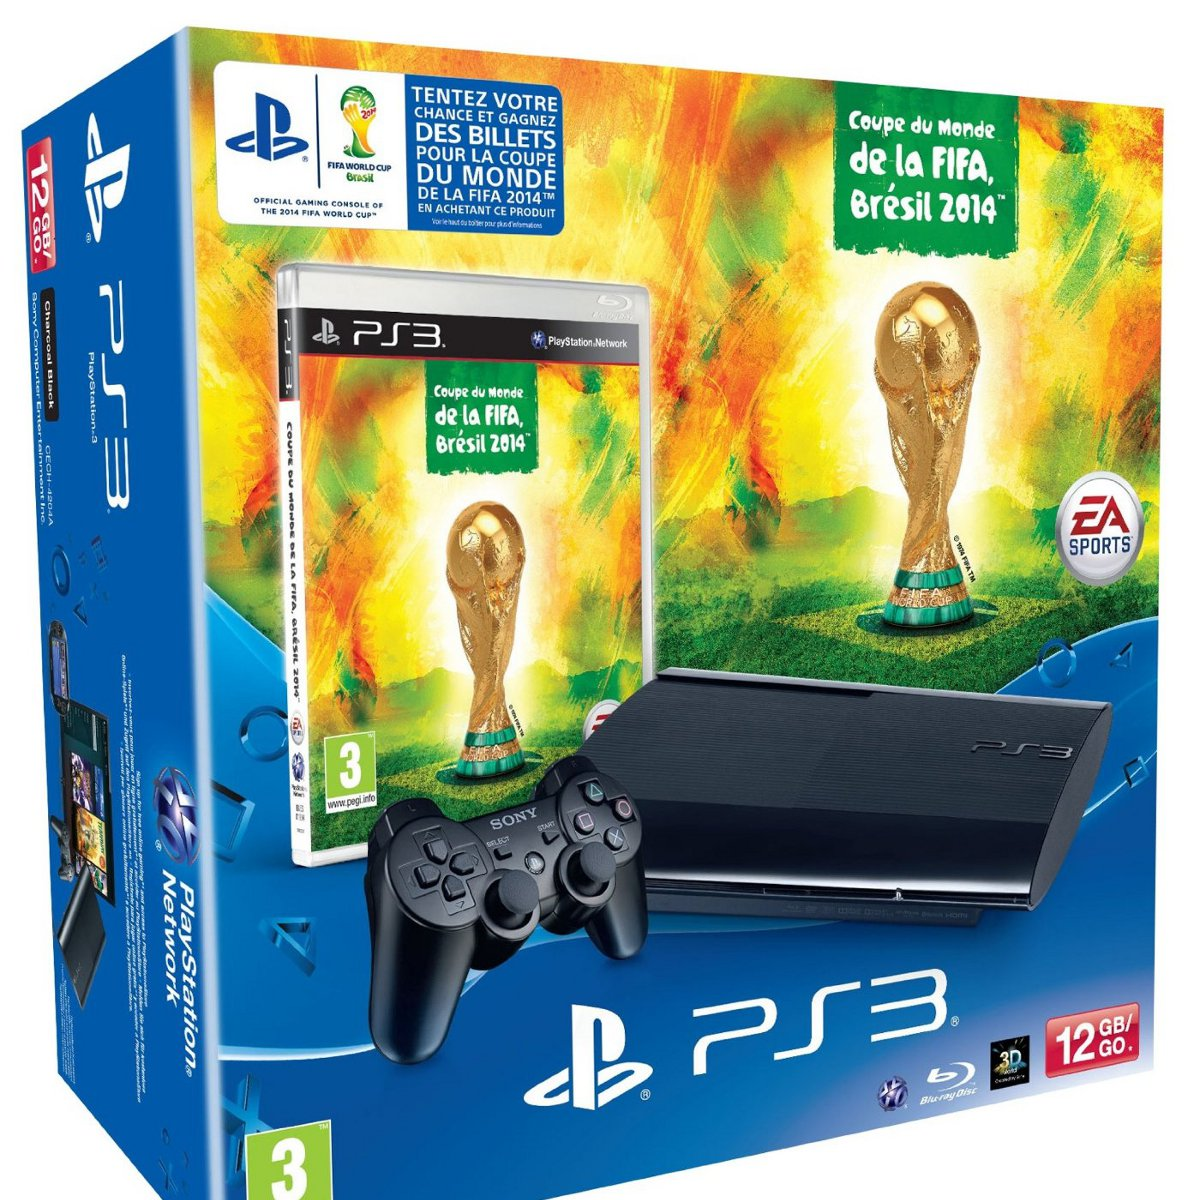 Sony playstation 3 ultra slim coupe du monde de la fifa - Coupe du monde de la fifa bresil ps ...